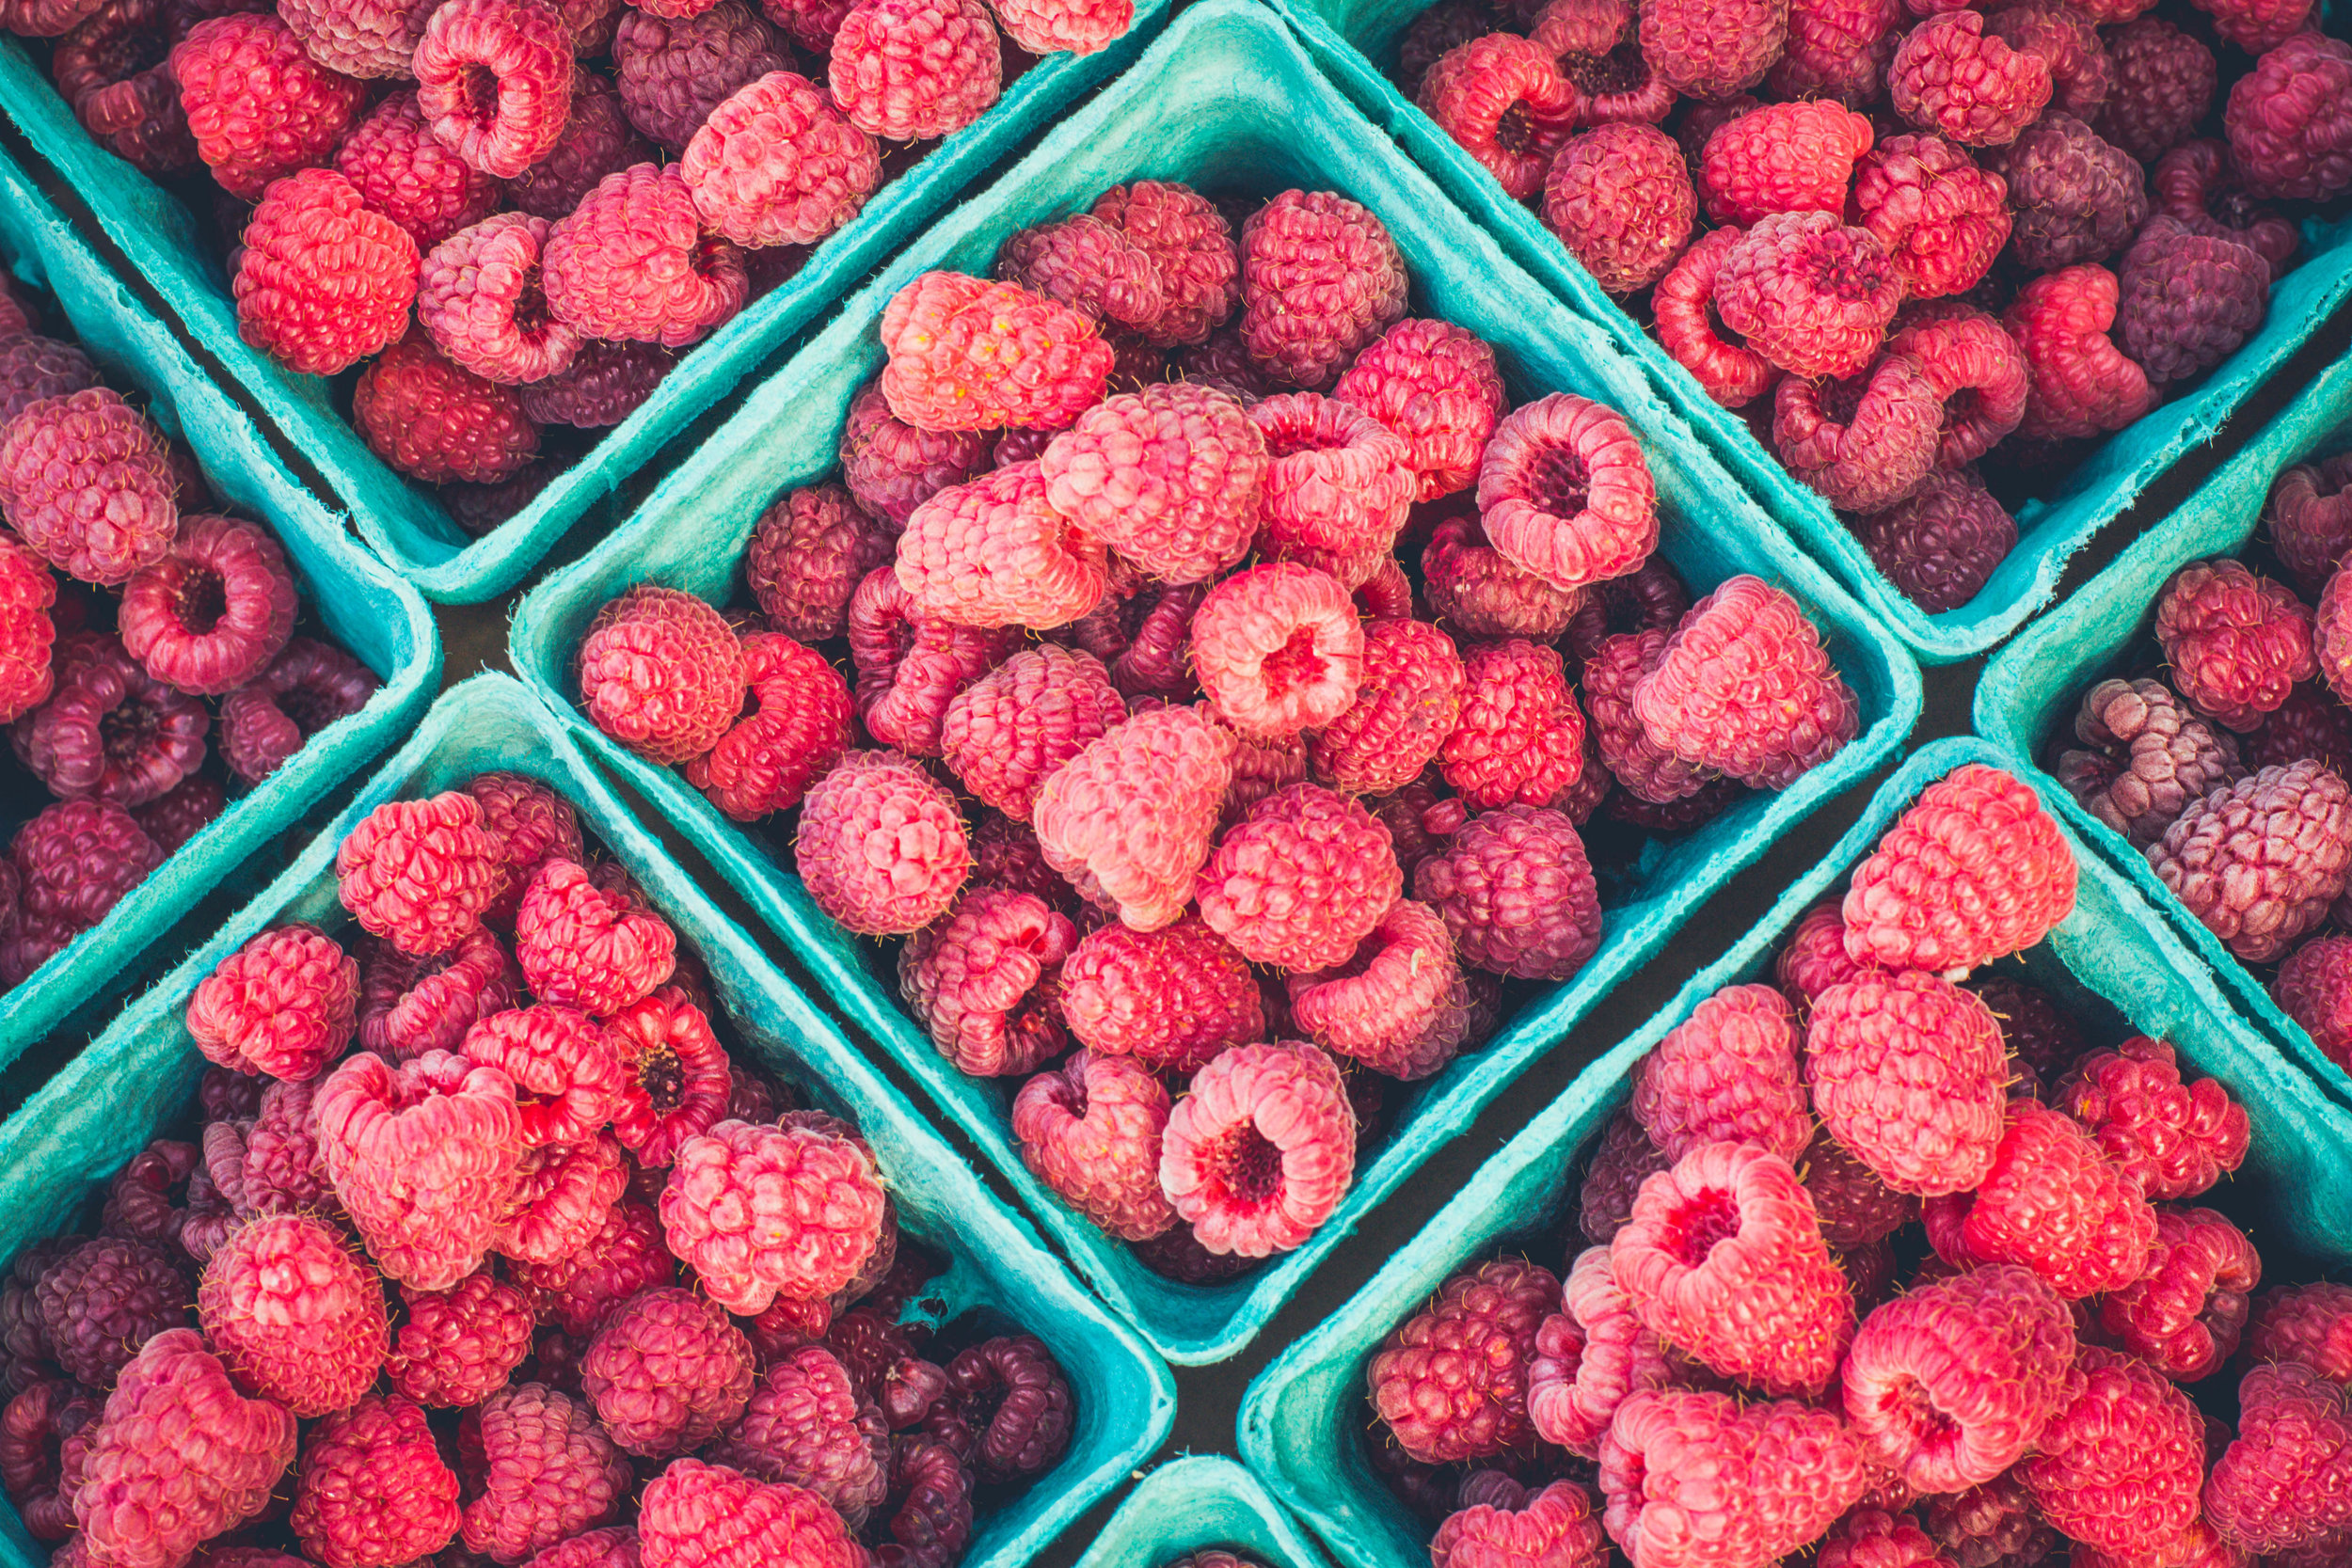 Antioxidants for Autoimmune Disease and Mental Health